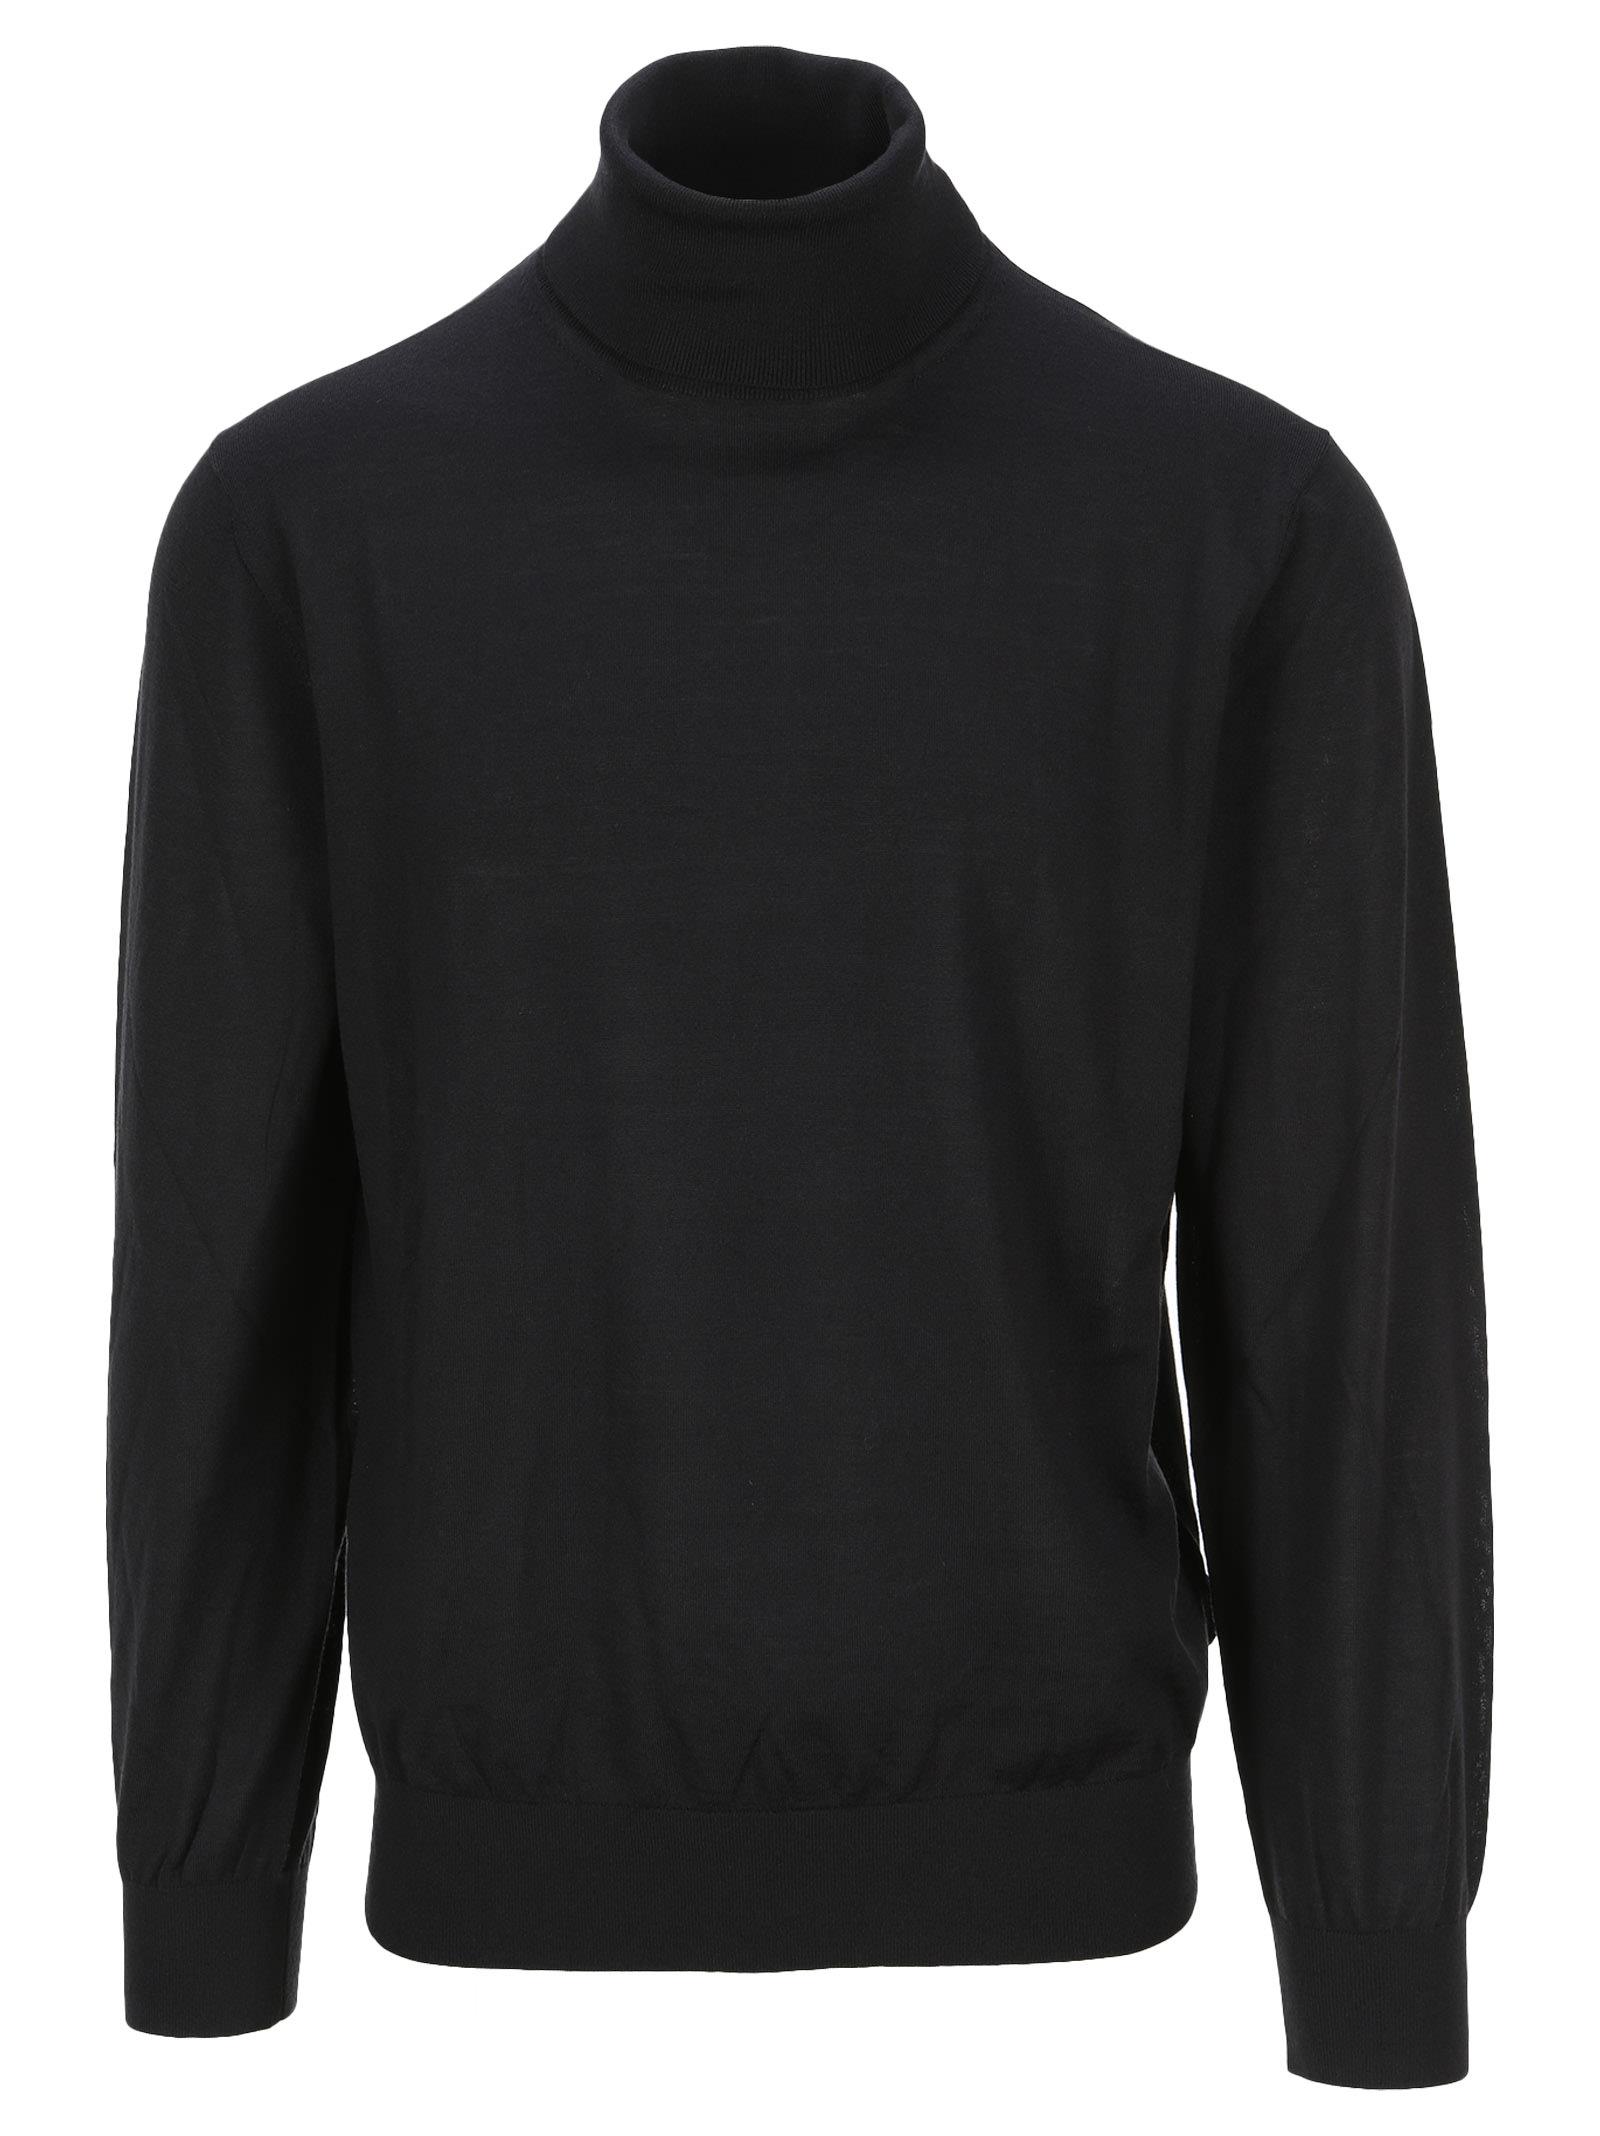 Z-zegna Classic Roll-neck Sweater